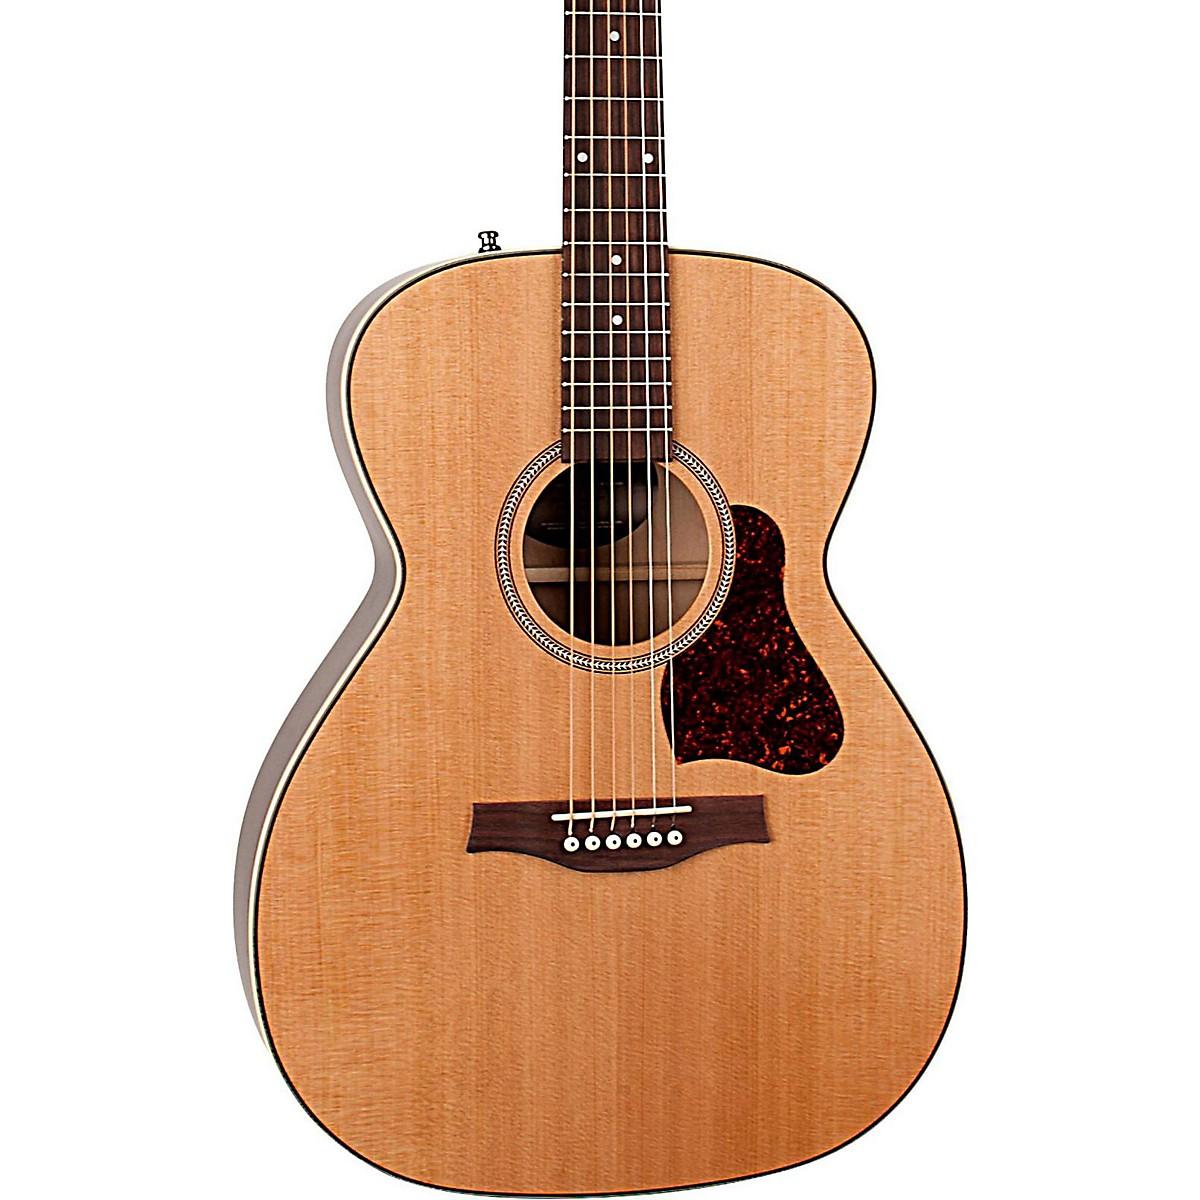 Seagull Coastline CH Momentum HG Acoustic-Electric Guitar